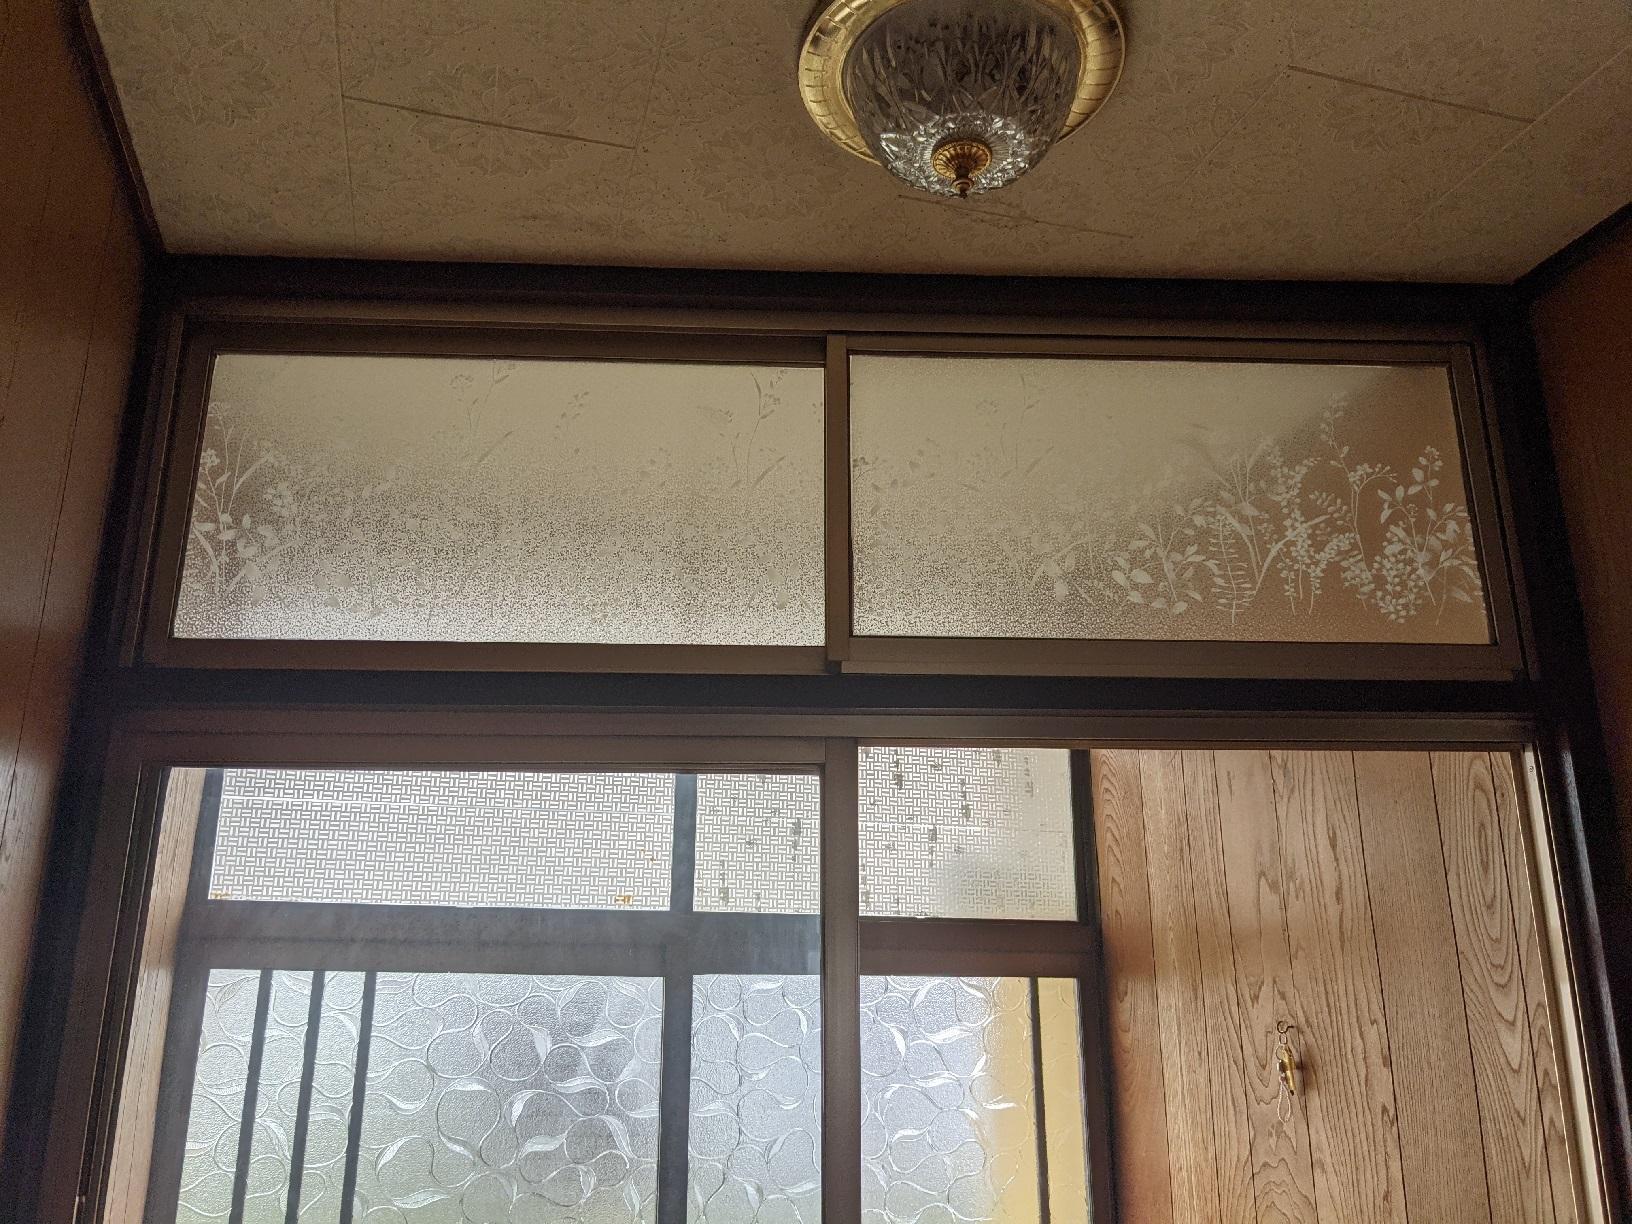 桜ヶ岡物件 施工後外観23